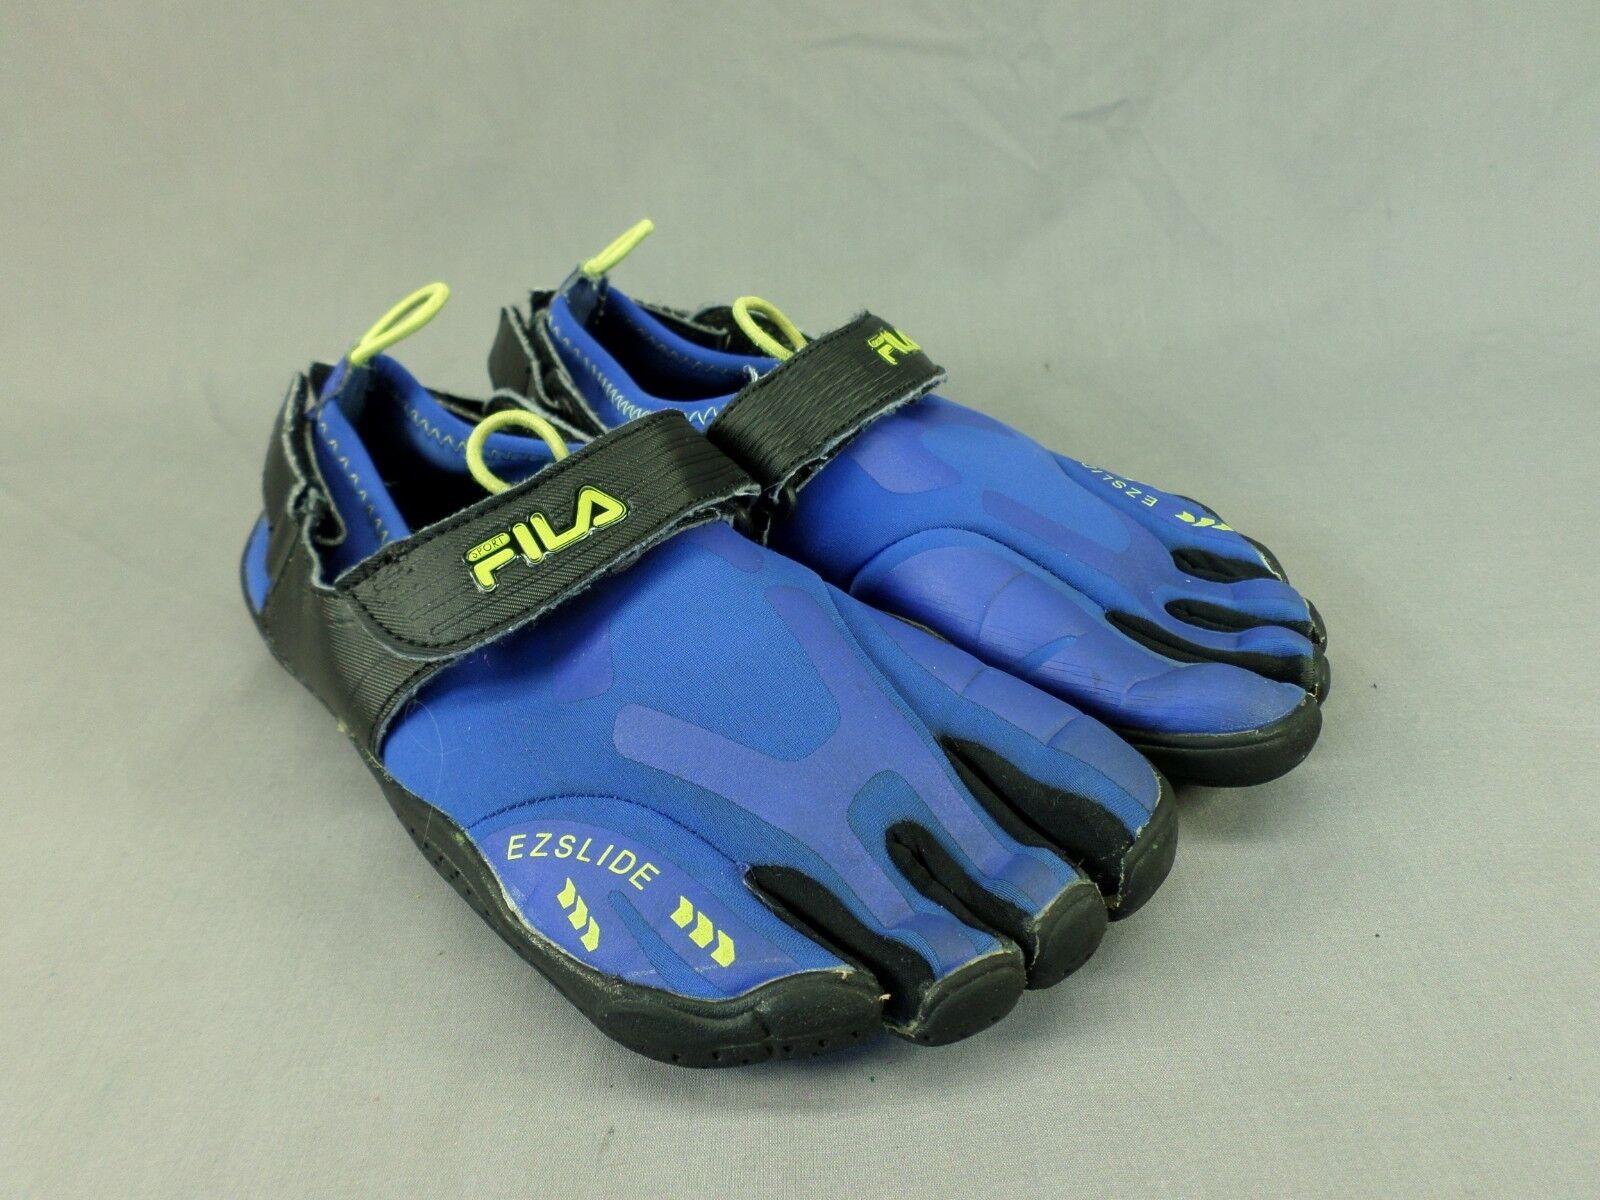 Fila Skele-toes Running Shoes EZ Slide Water Barefoot Sneaker Blue US 7  Comfortable and good-looking